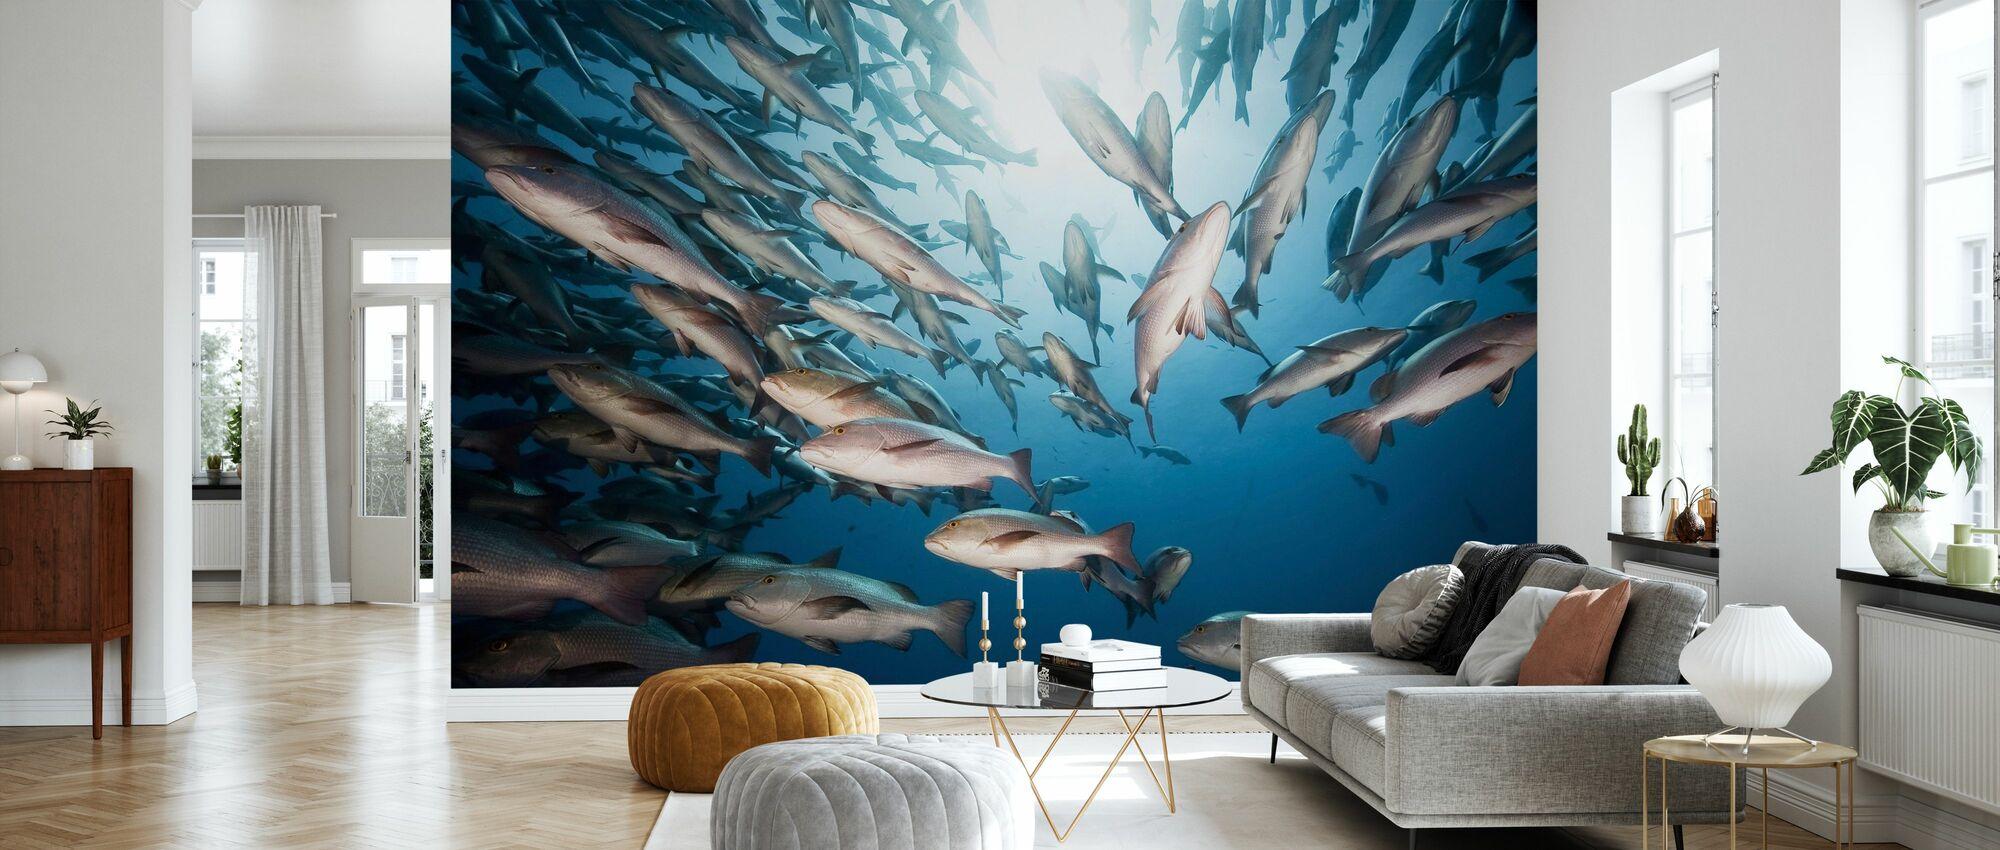 Mangrove Snappers - Wallpaper - Living Room